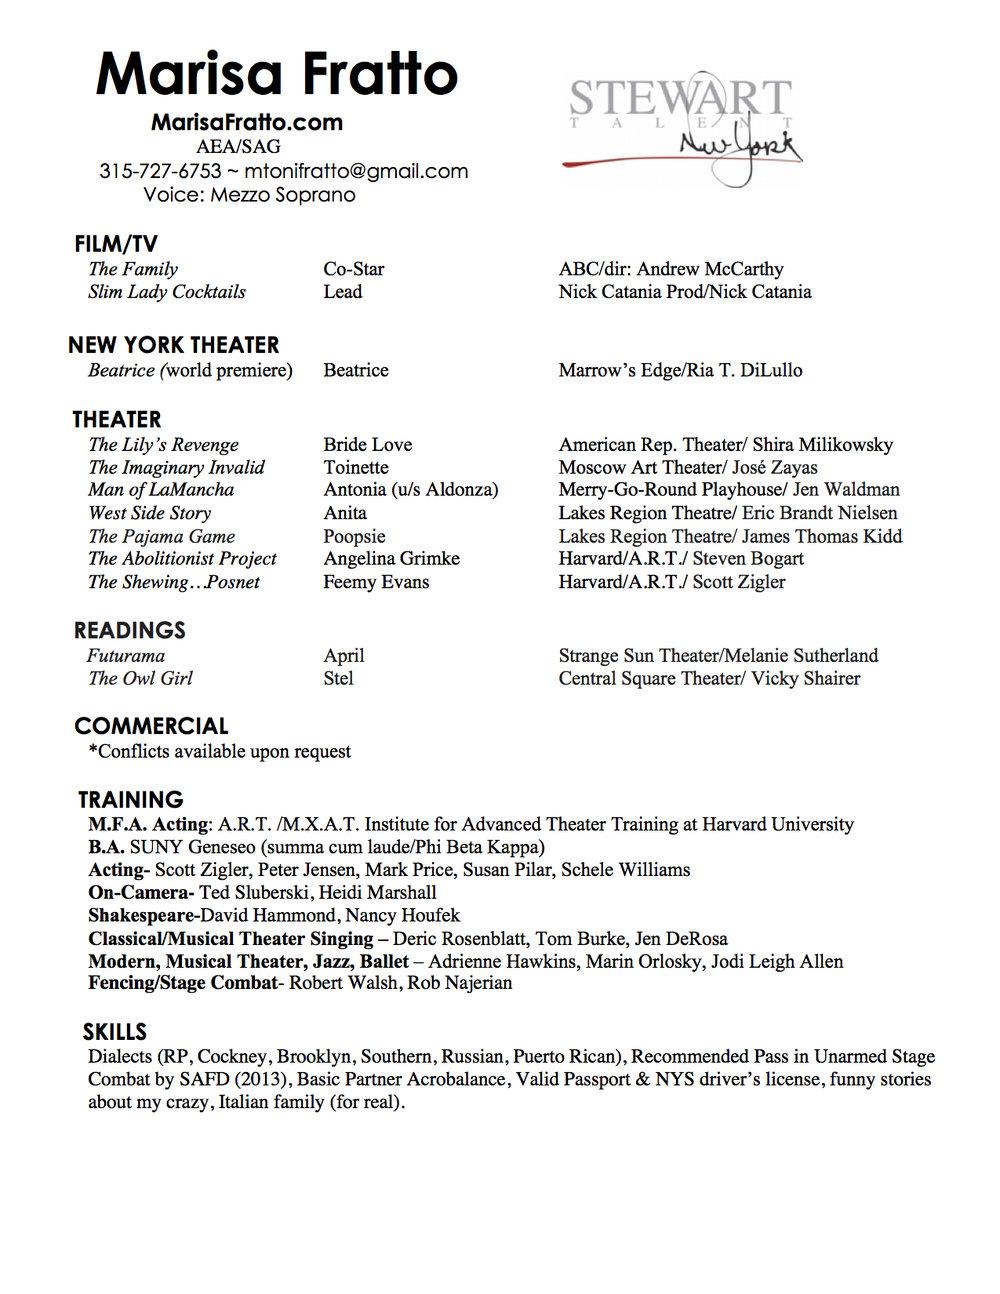 Marisa Fratto Acting Resume 2017.jpg